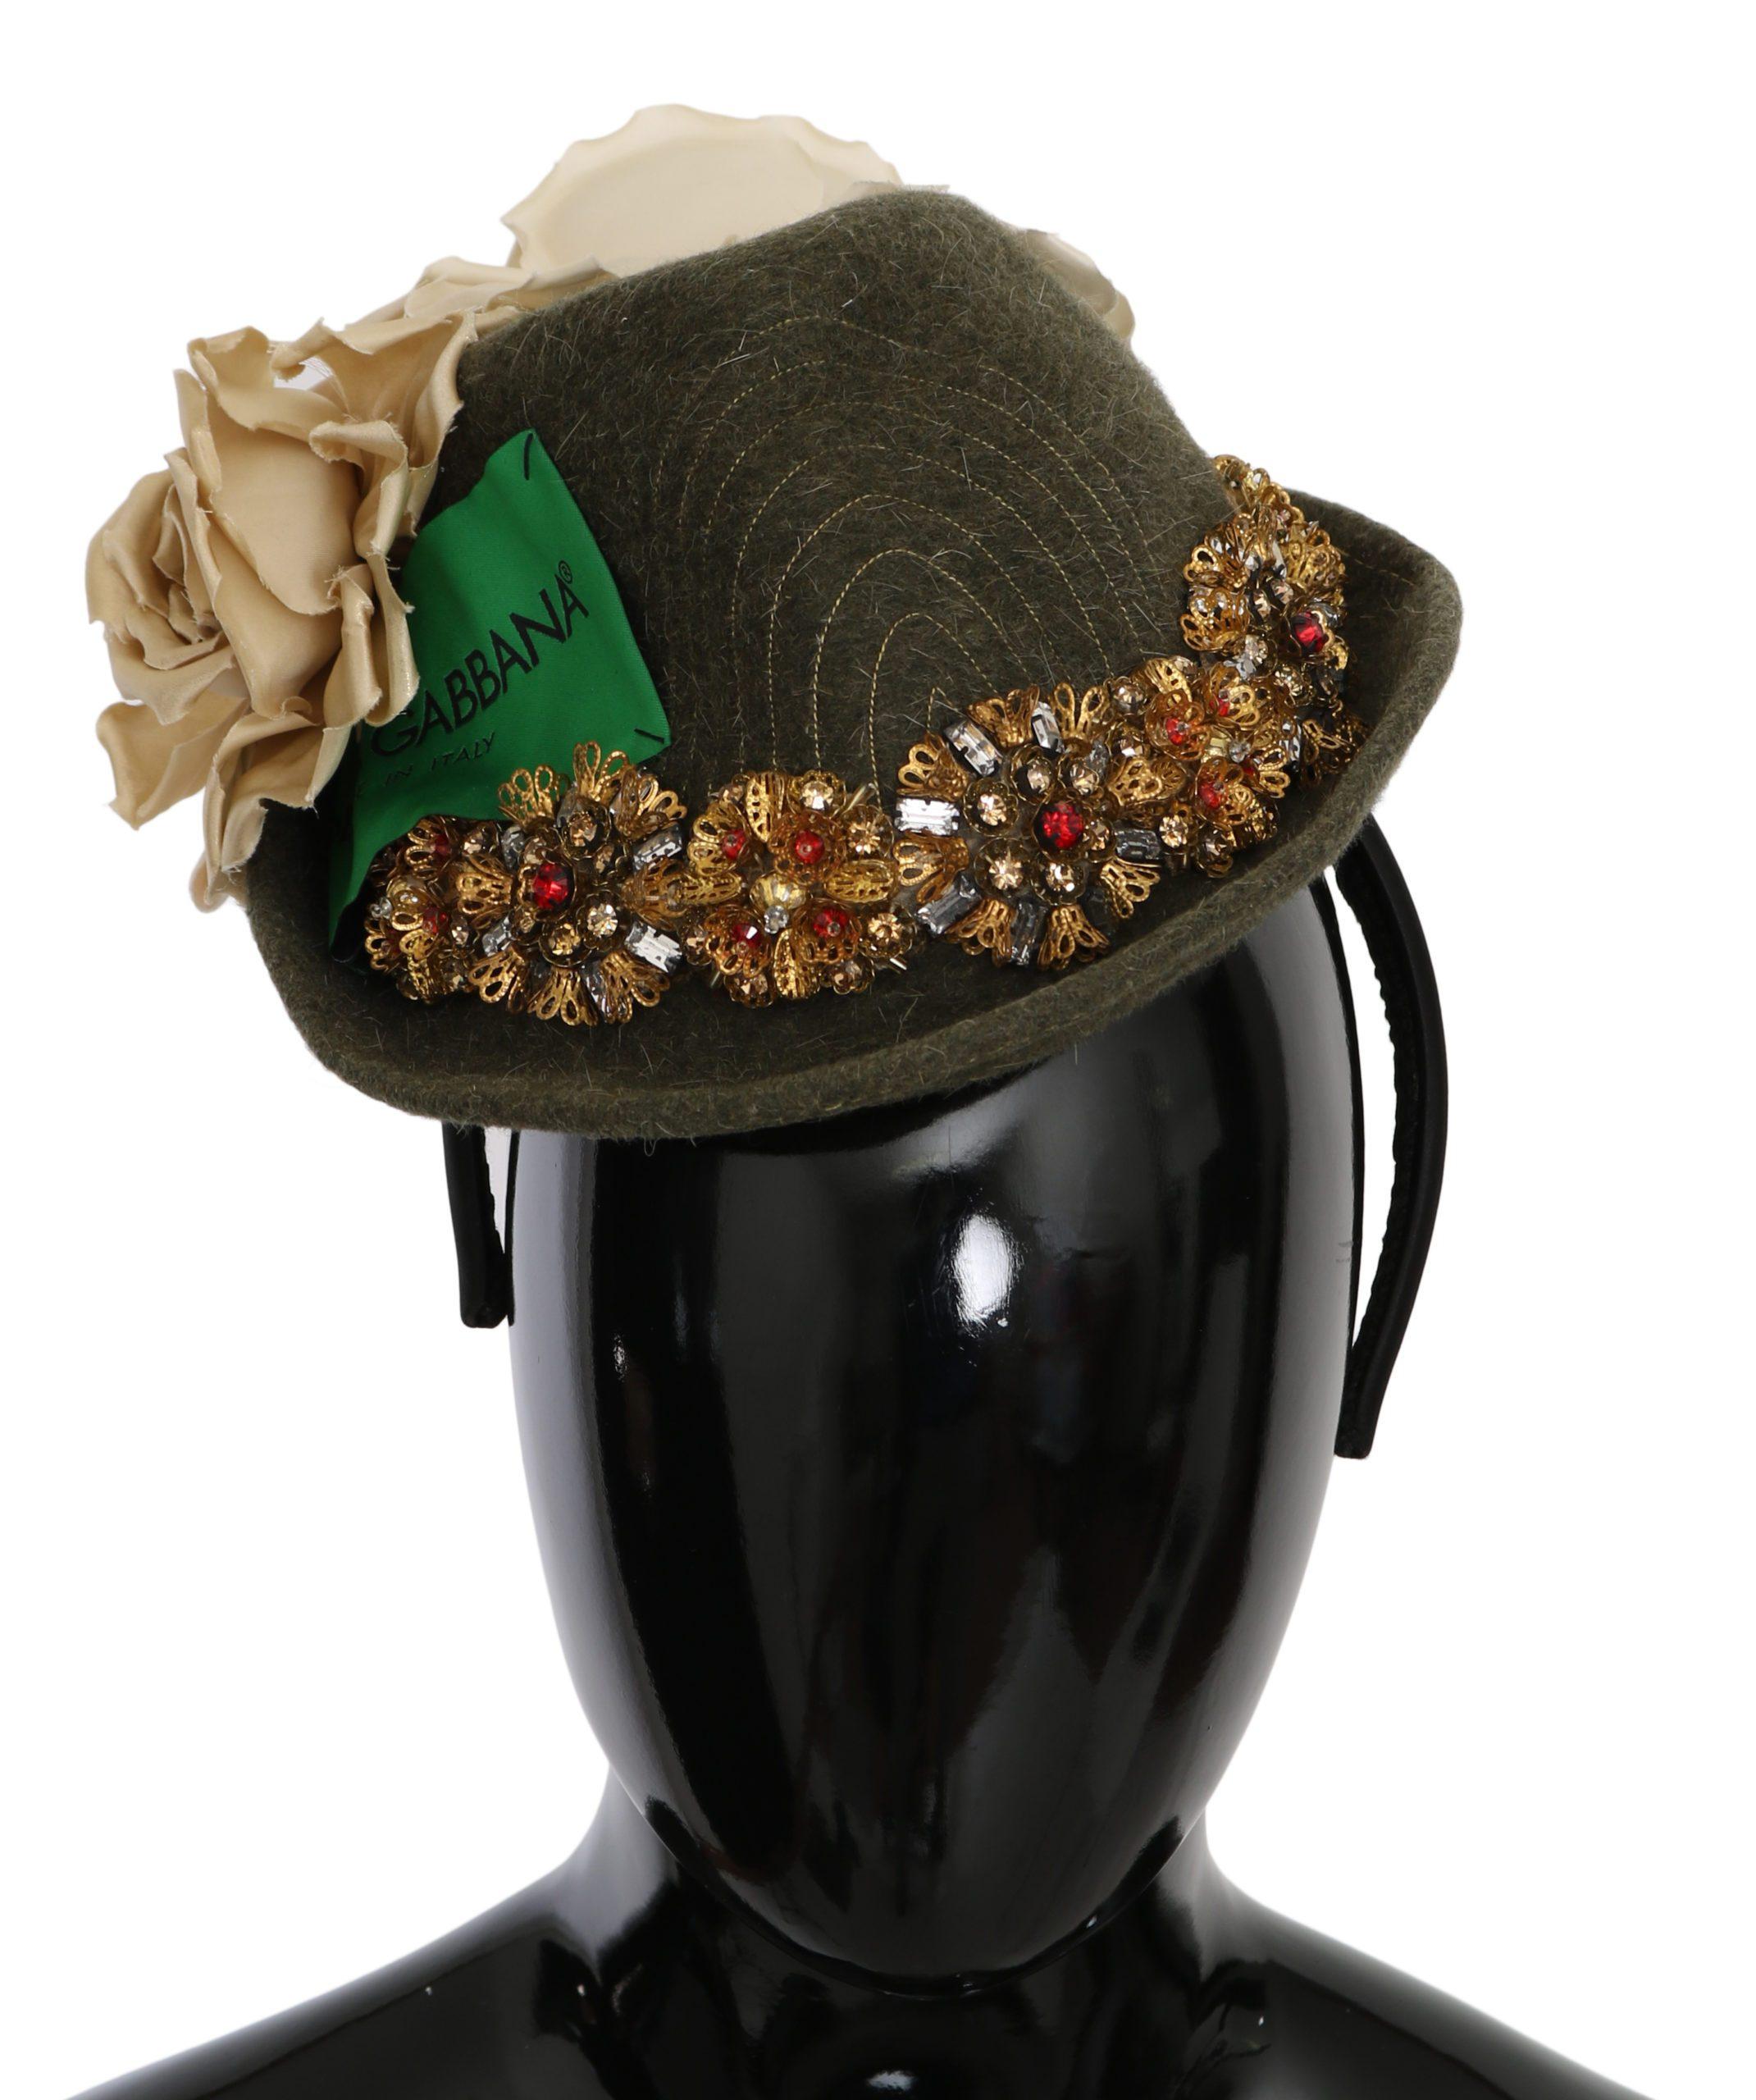 Dolce & Gabbana Women's Floral Crystal Studs Tiara Hat Green HAT9062